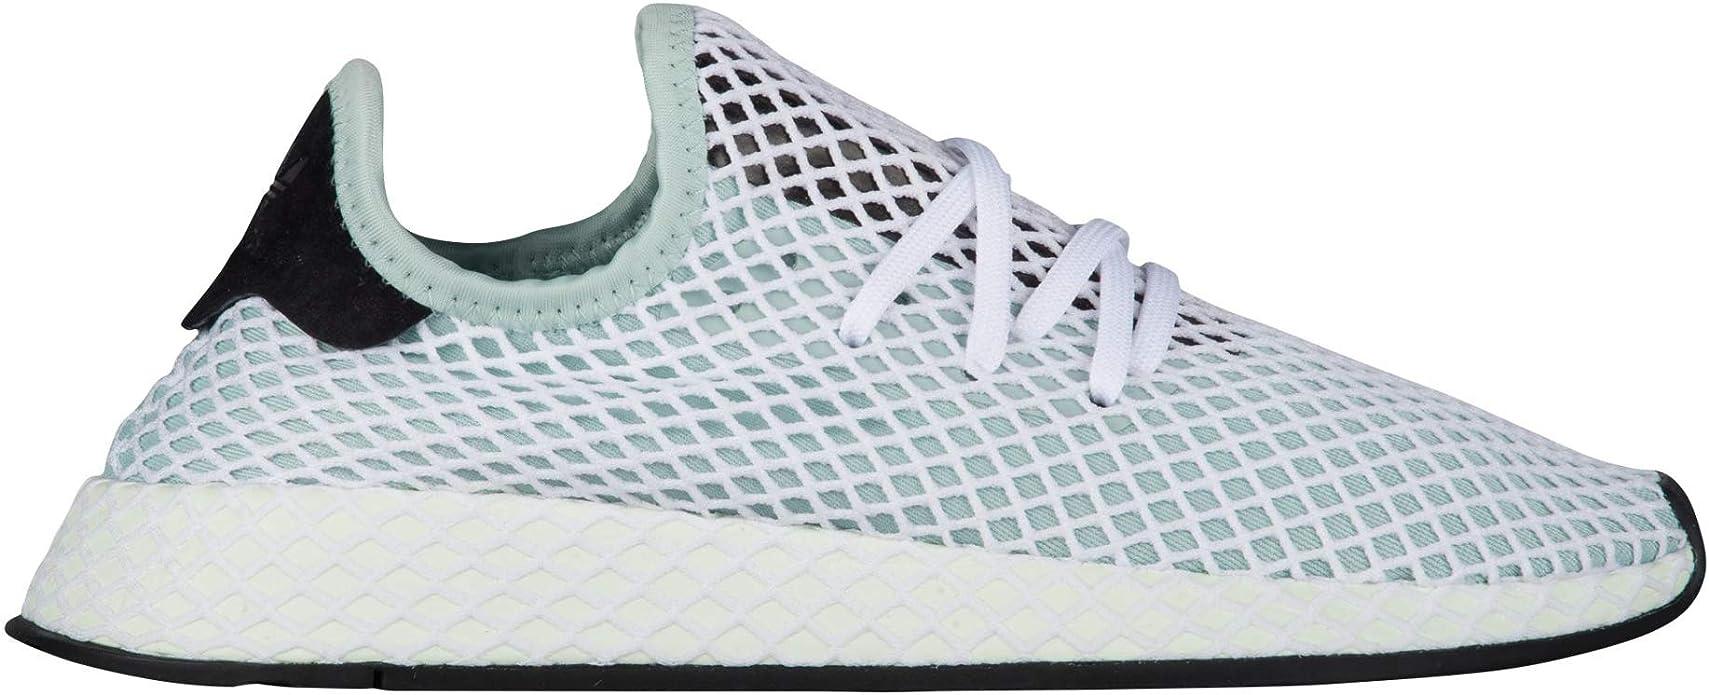 adidas Women's Originals DEERUPT Runner Shoes (CQ2911